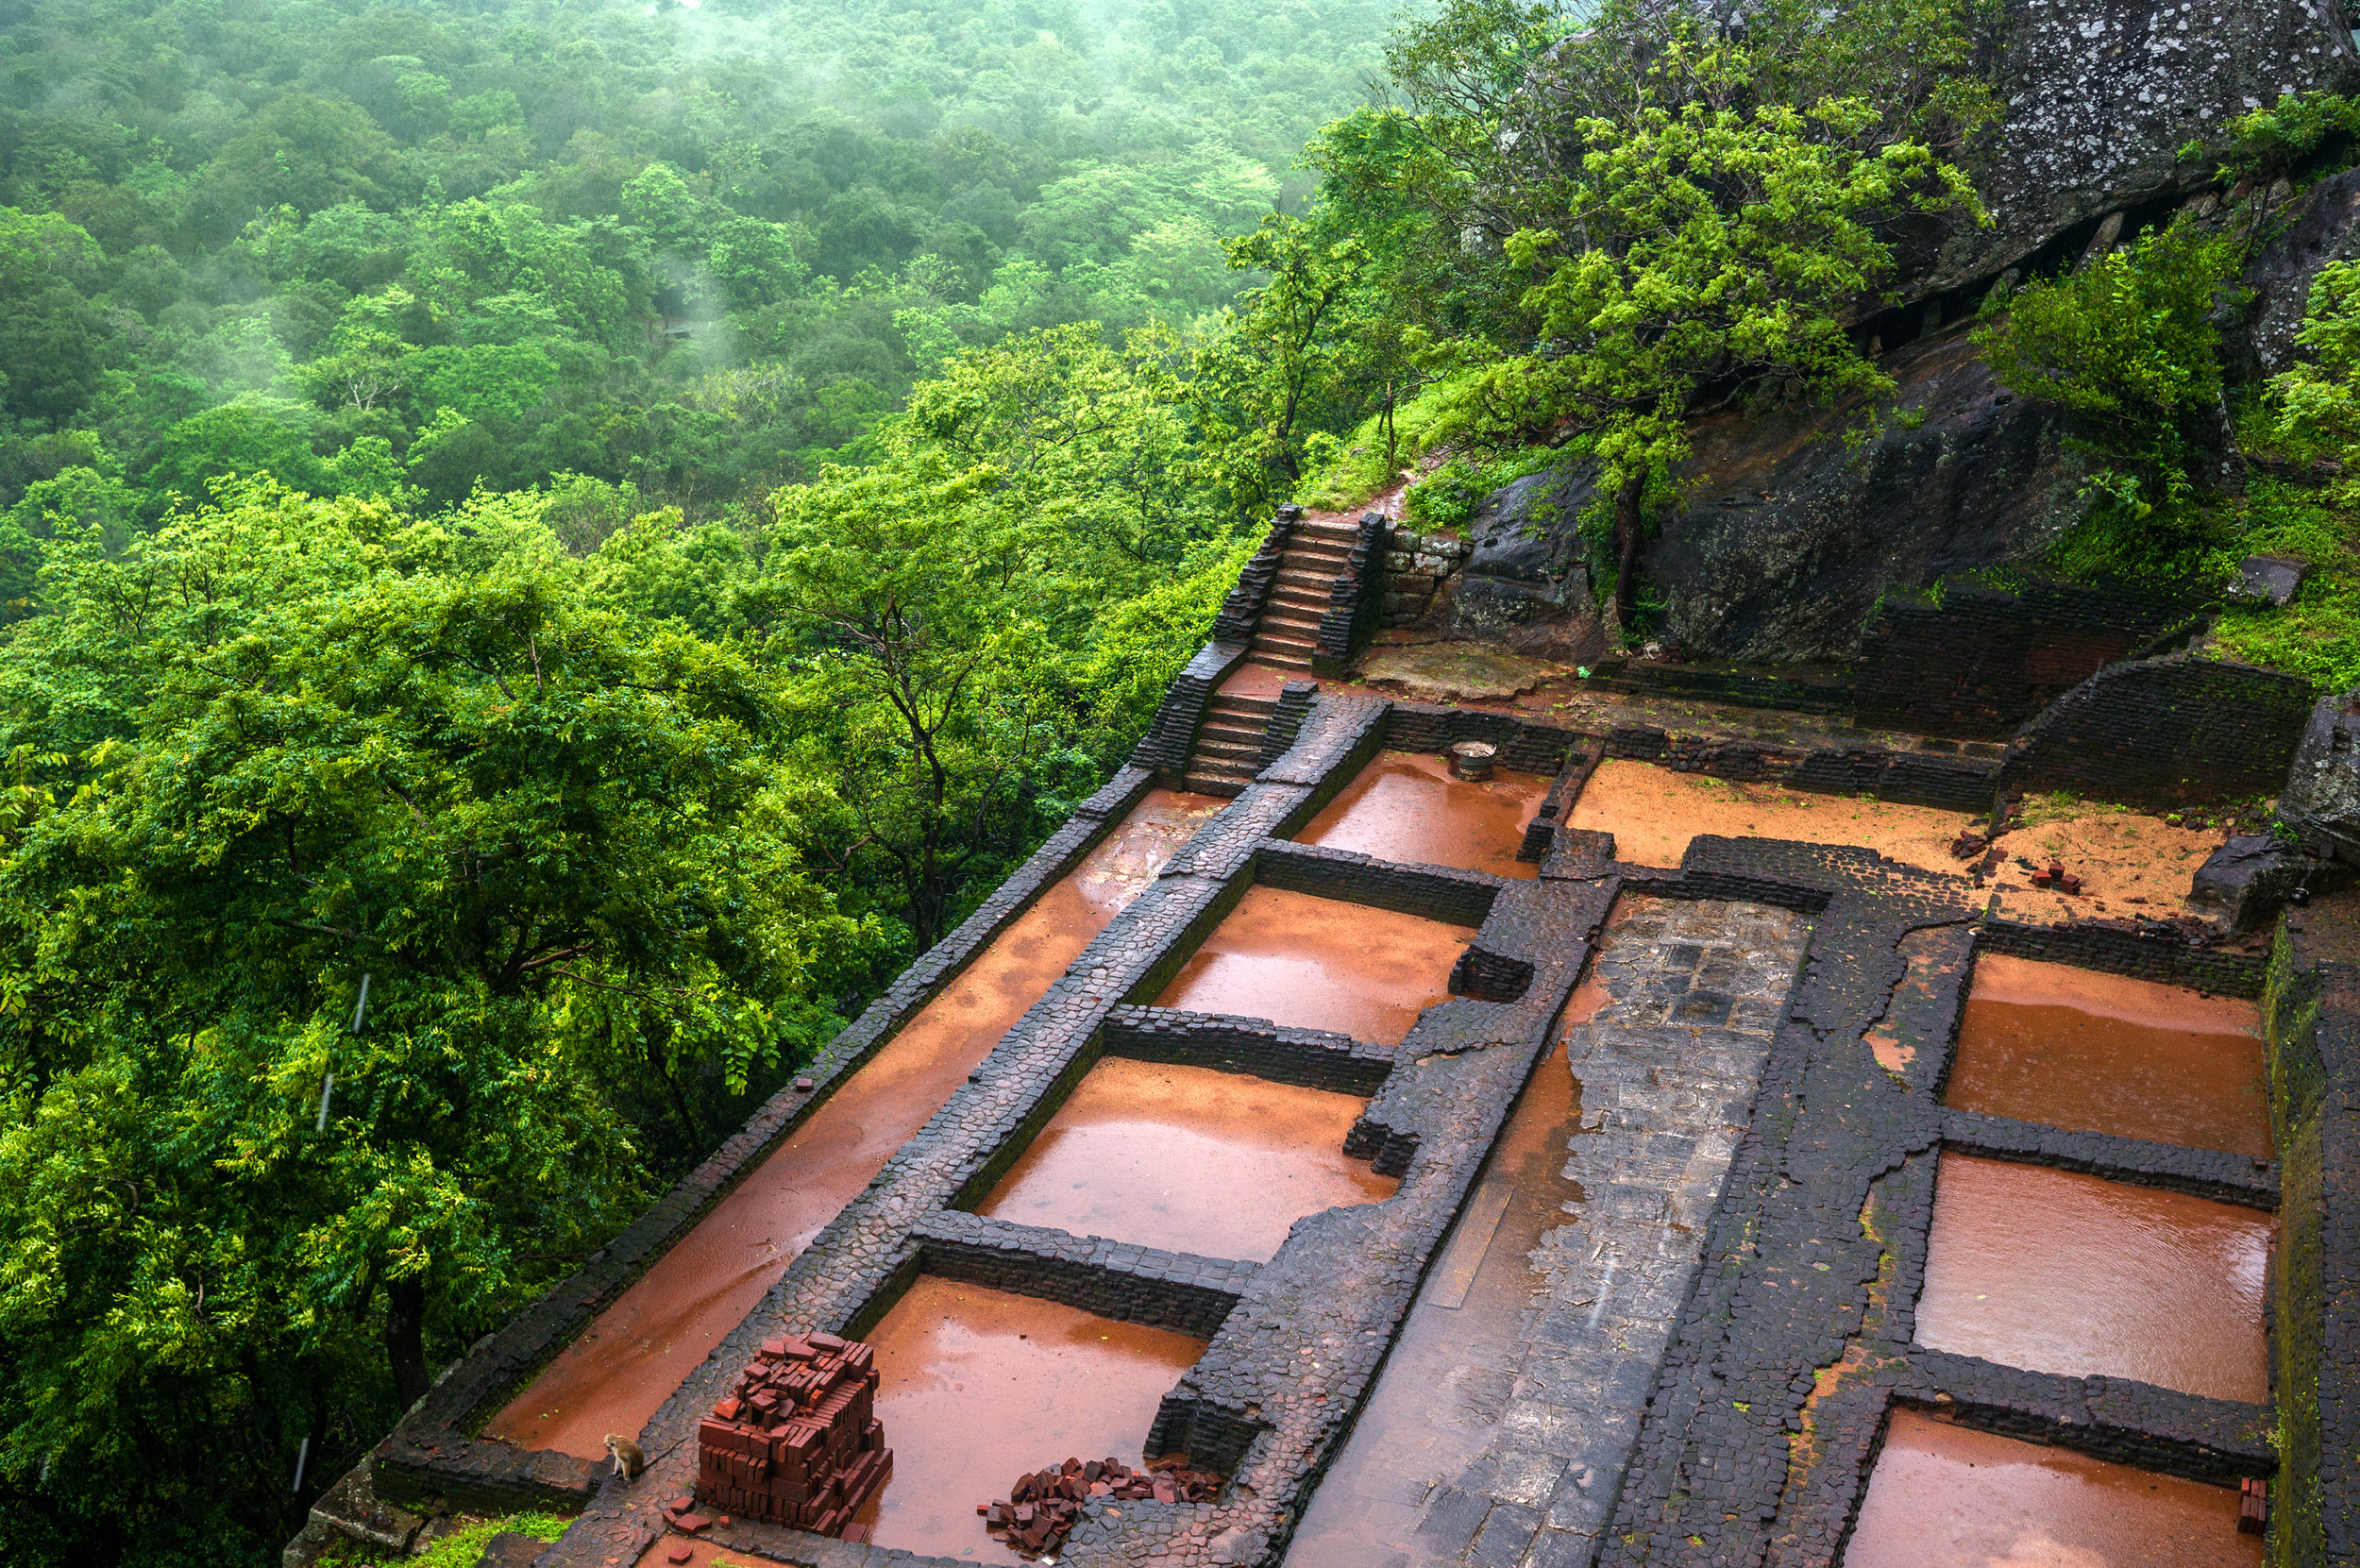 srilanka_sigiriya_bigstock--163178969.jpg